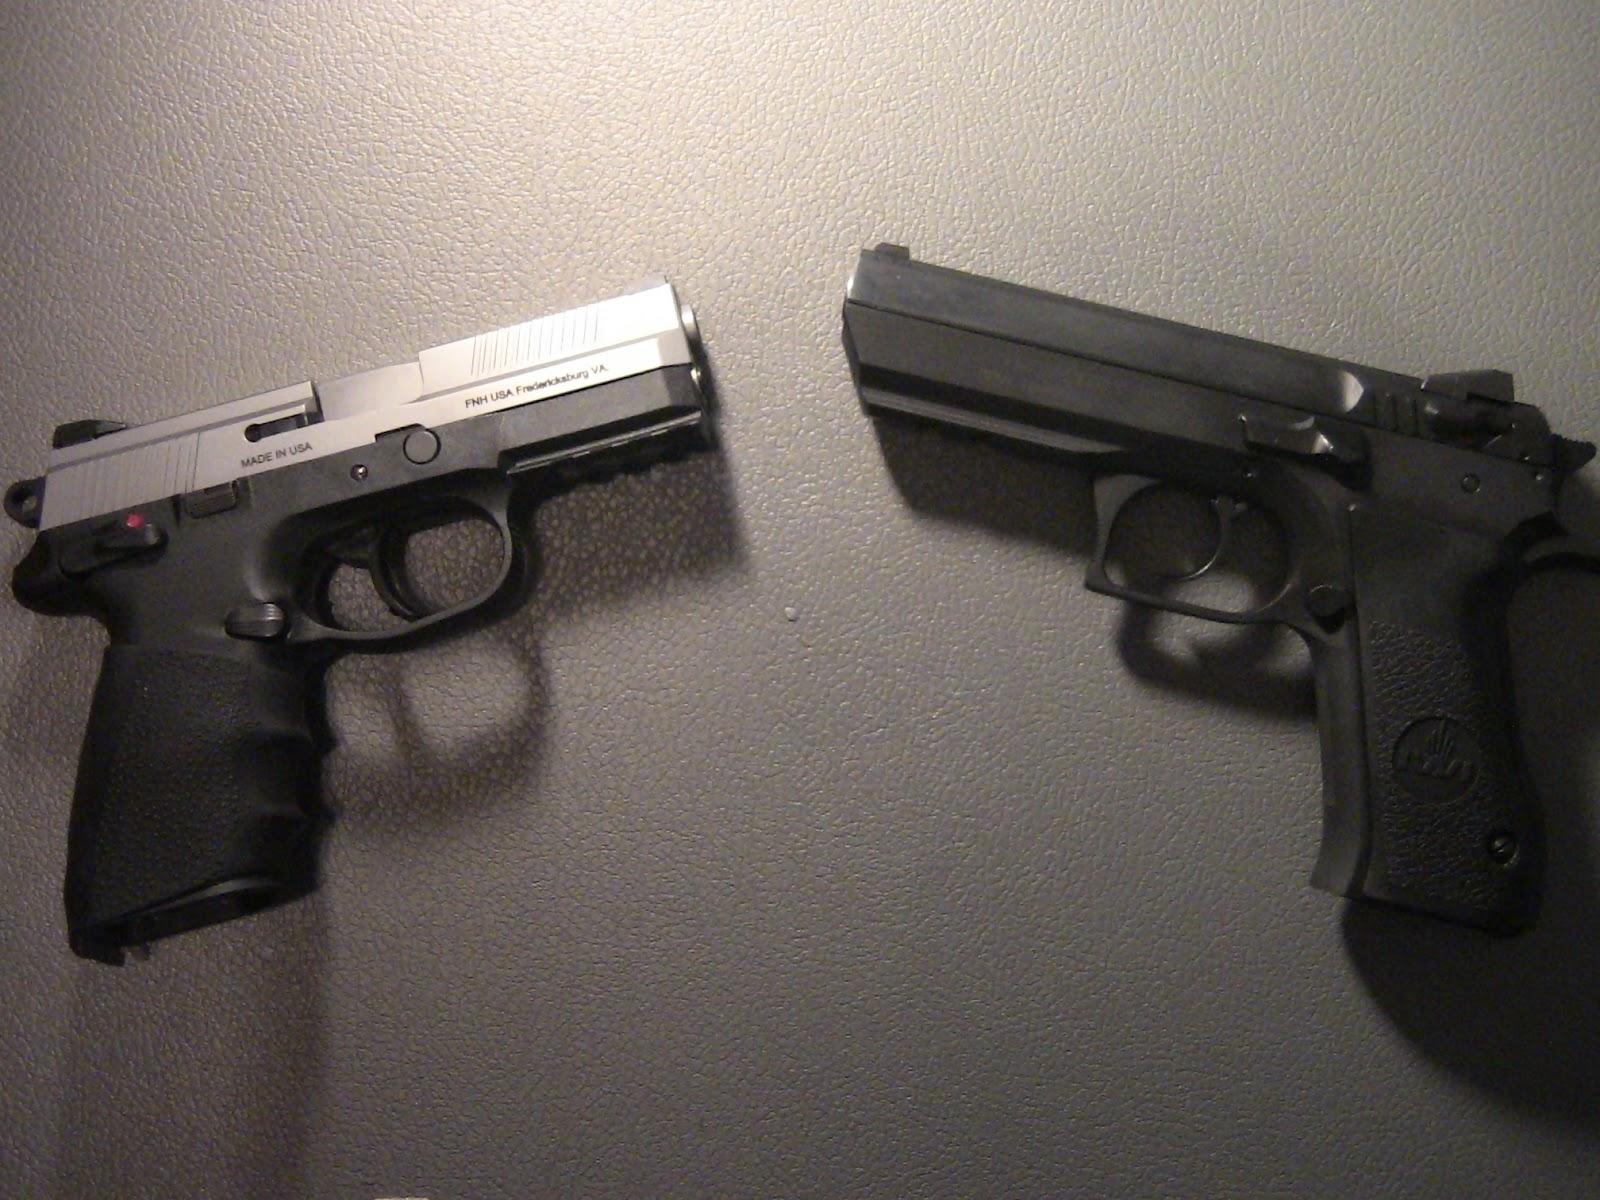 Polymer vs. Steel Frame Handguns | Firearm Reviews by Fullmetalfmj